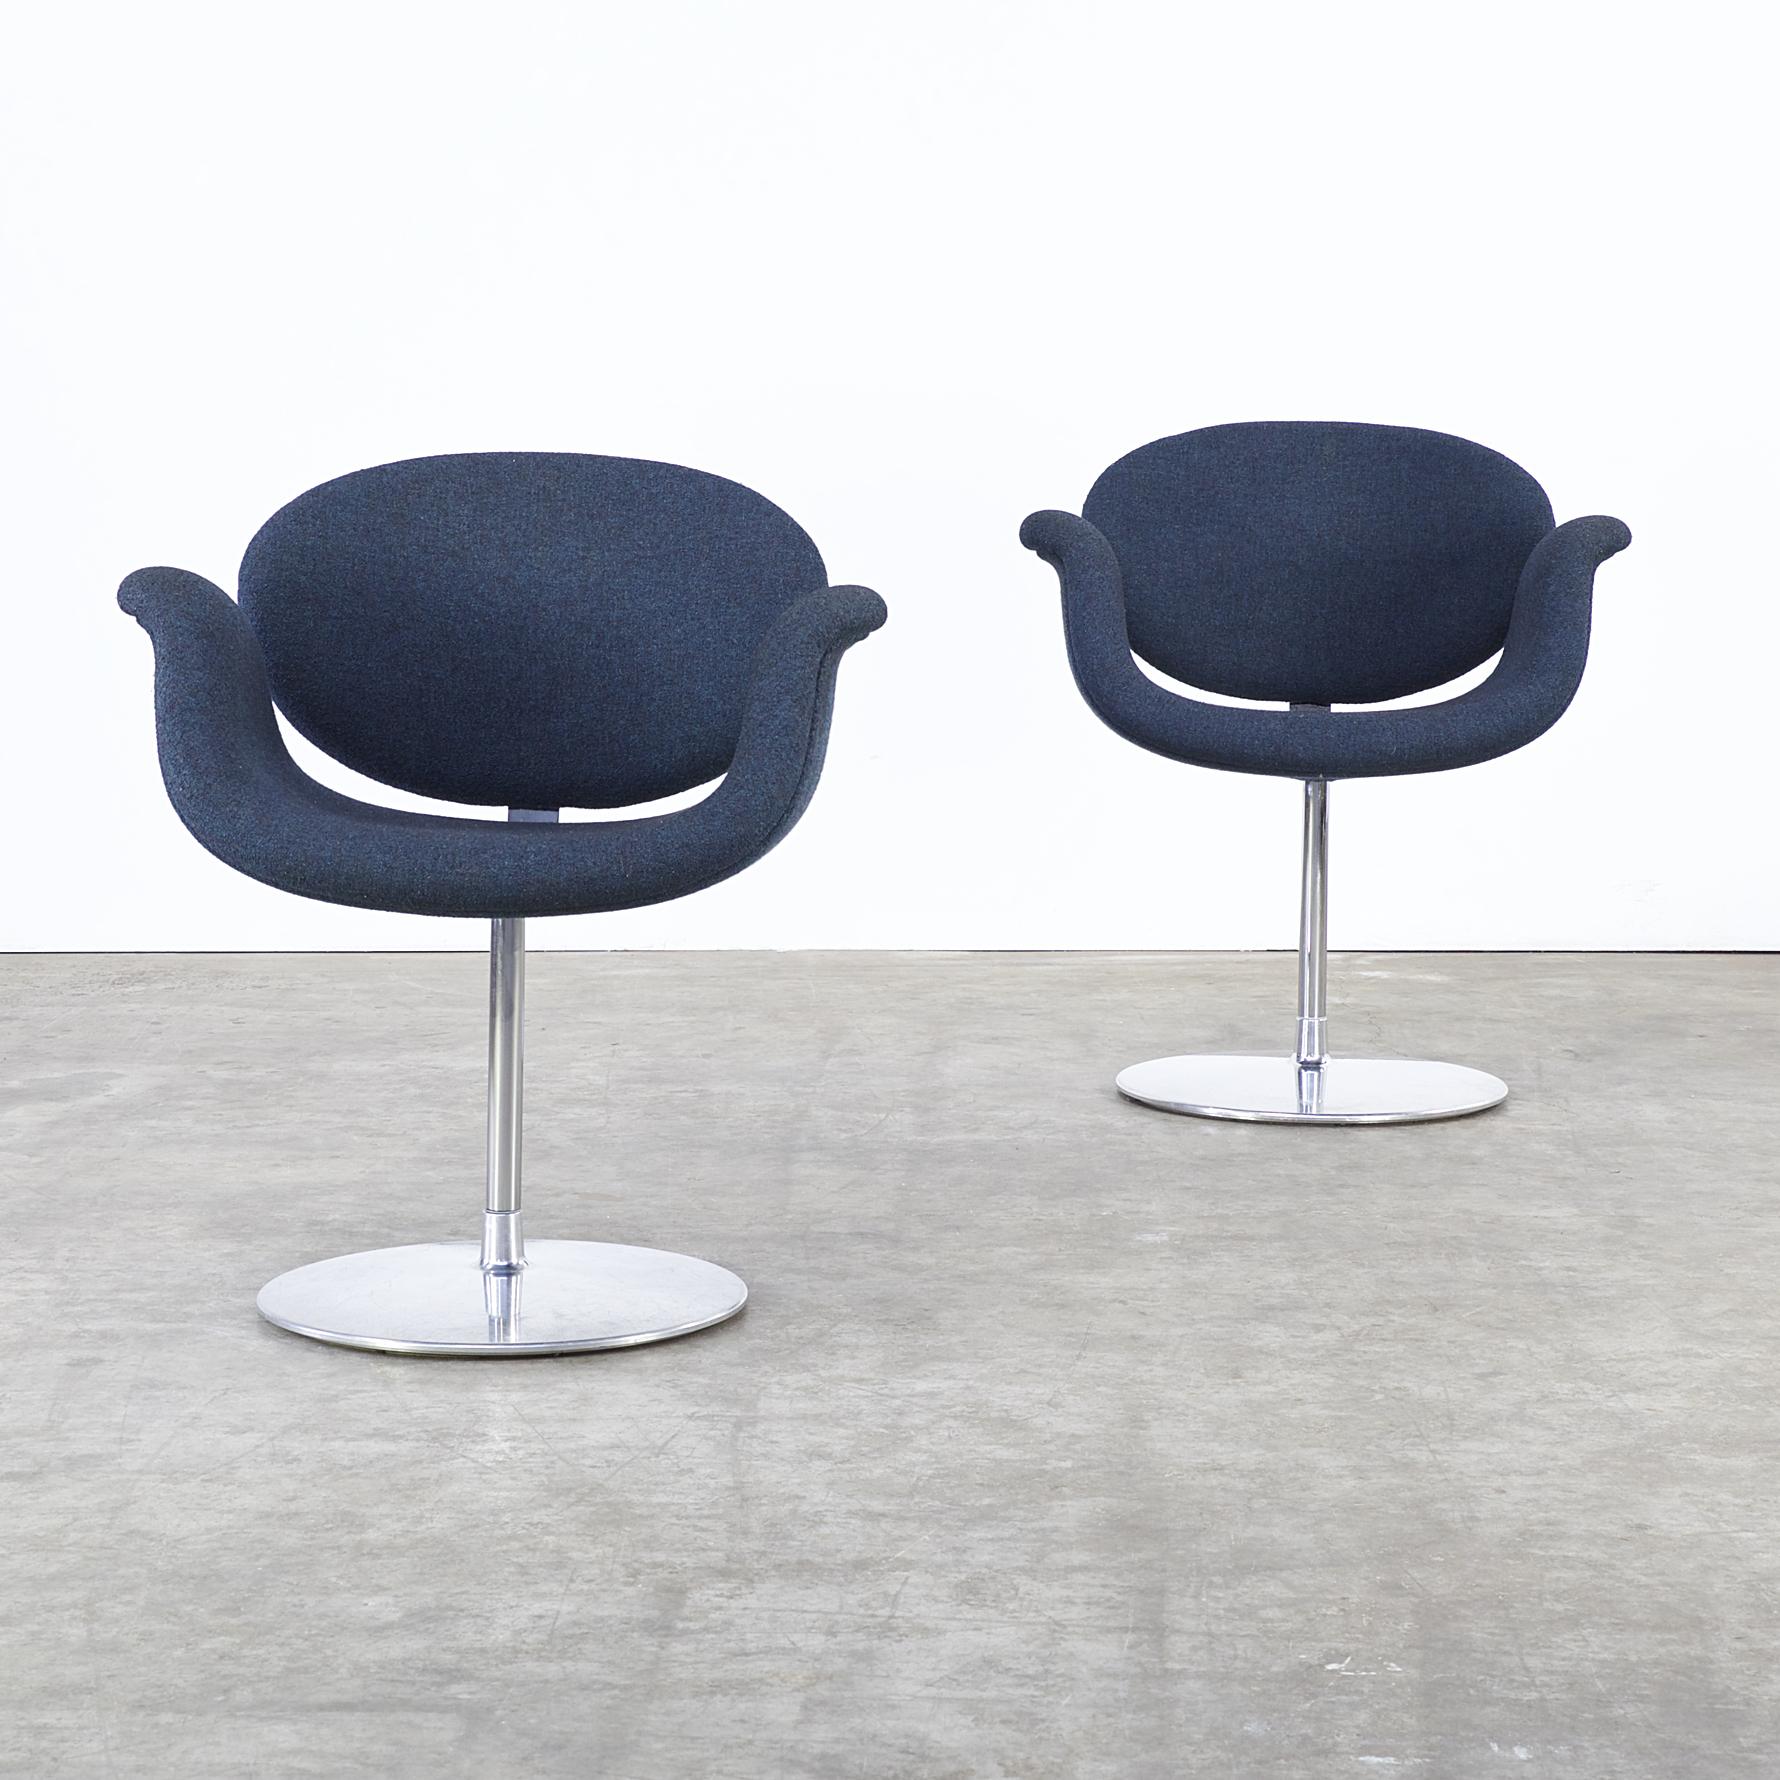 pierre paulin f163 little tulip fauteuil for artifort. Black Bedroom Furniture Sets. Home Design Ideas